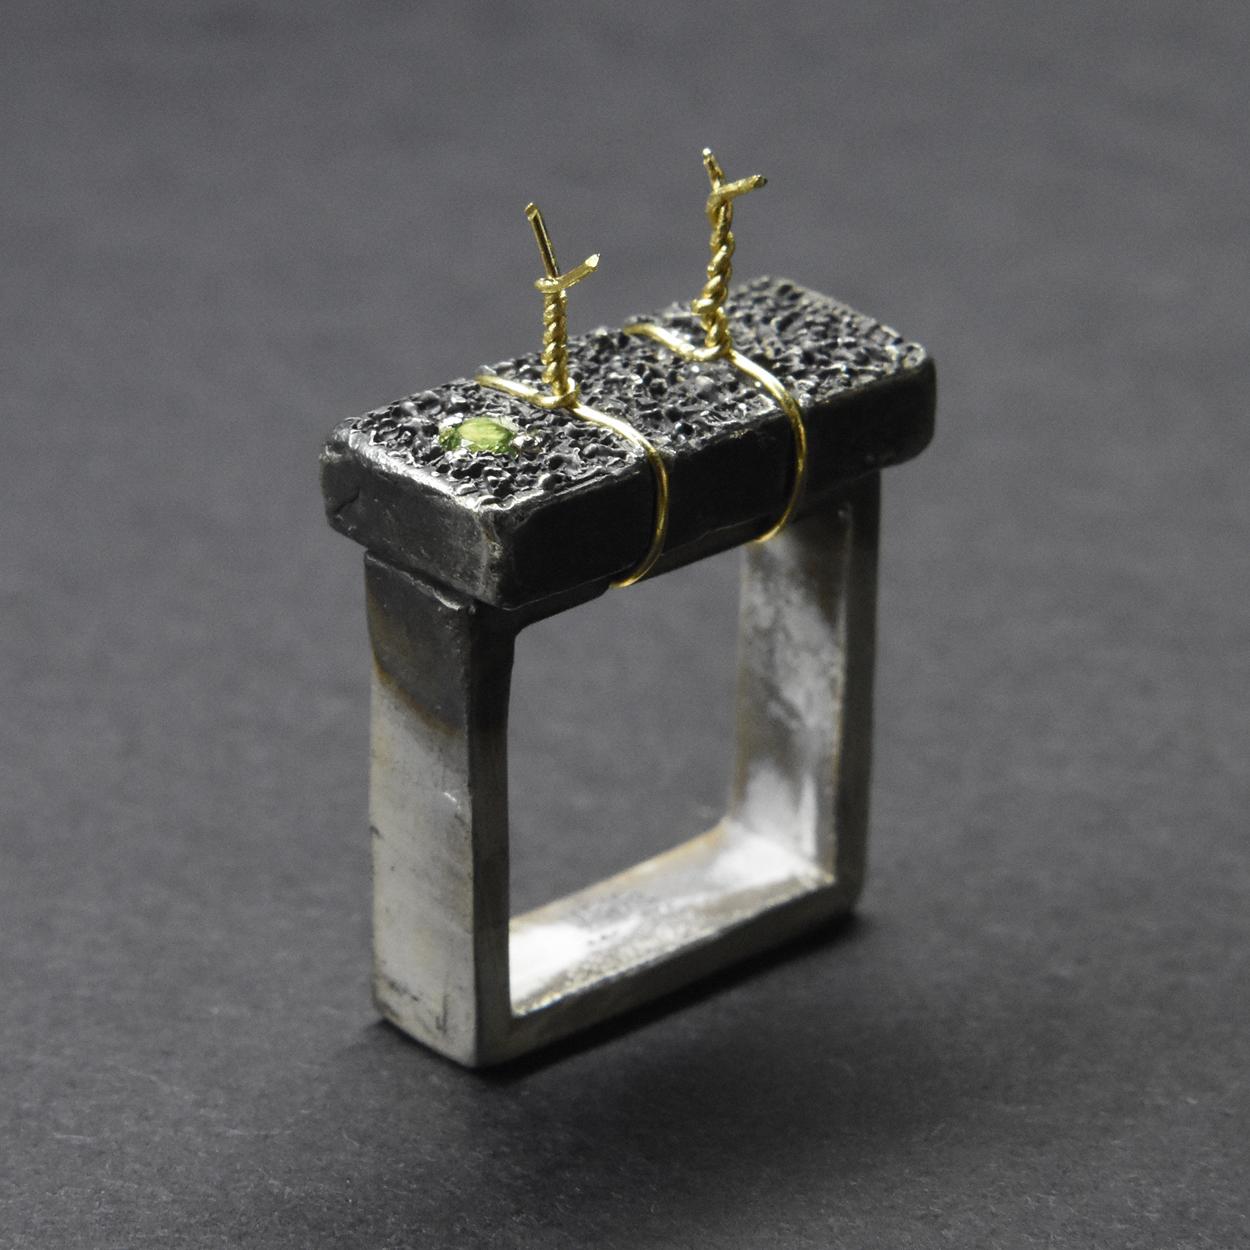 Microlith 14